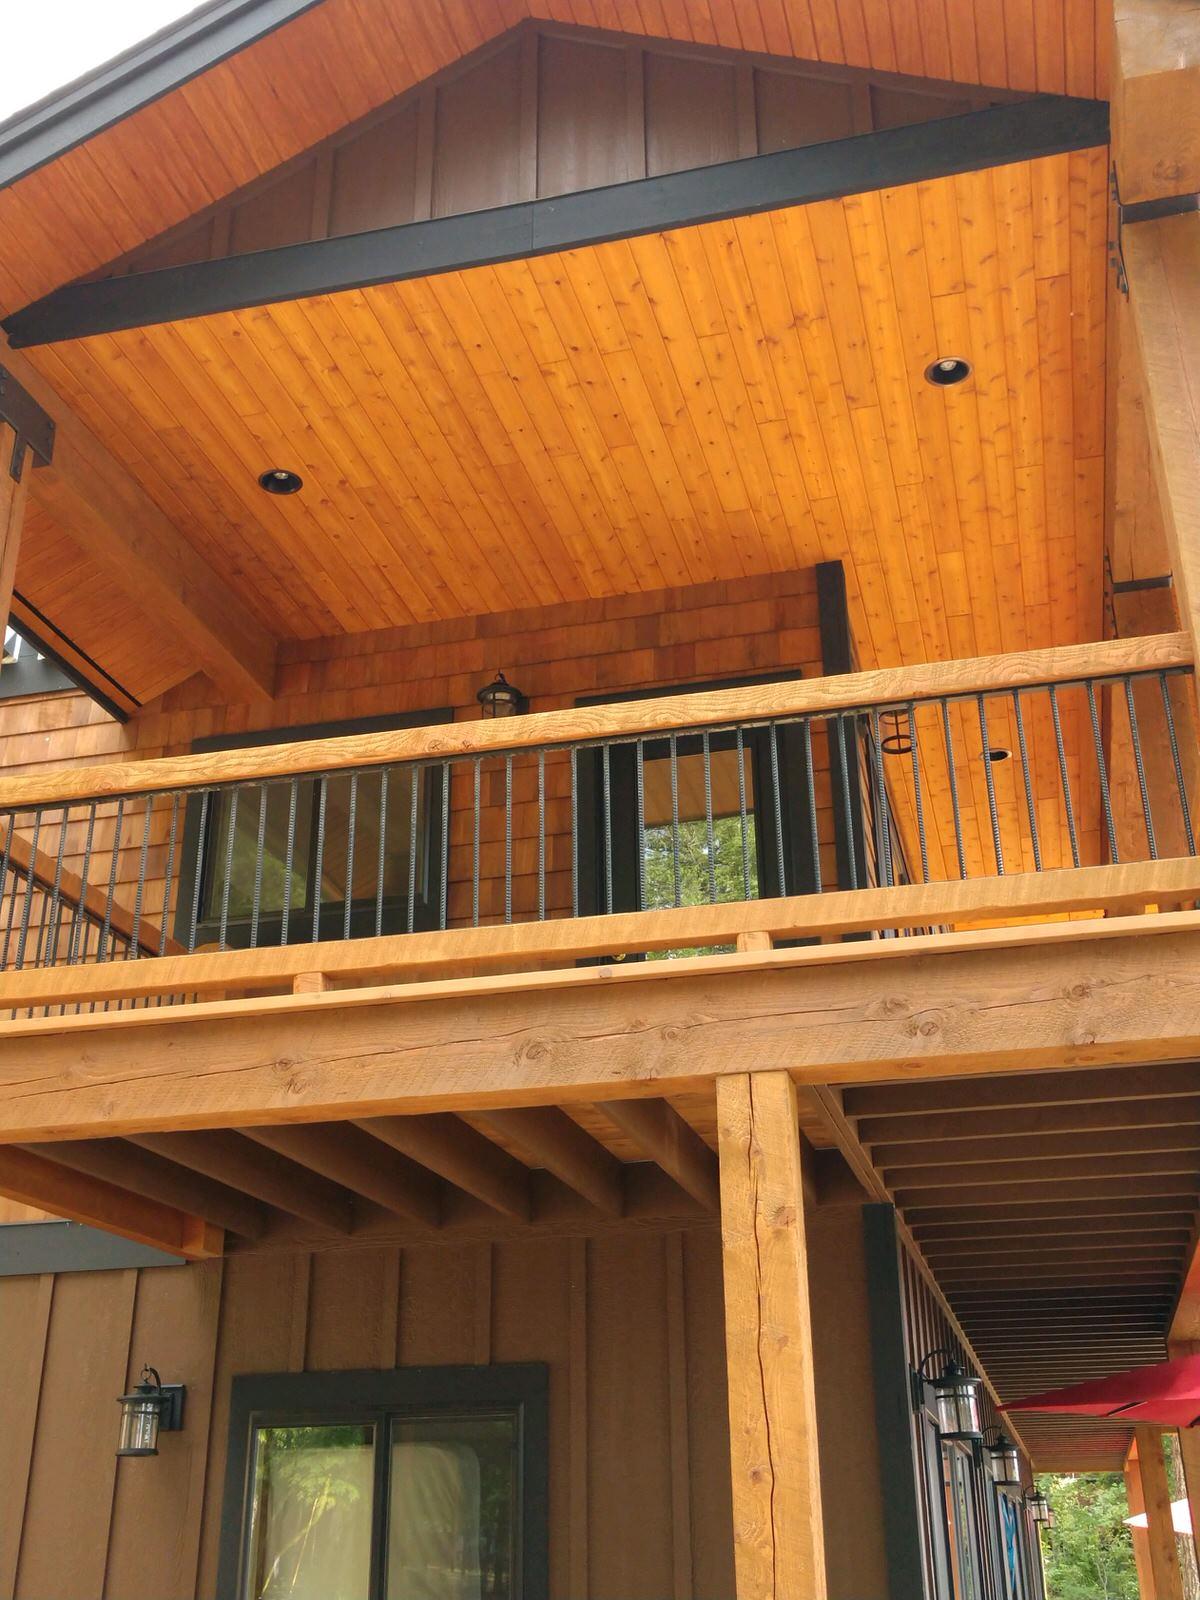 Rustic Rebar Inset 2nd story Tight.jpg